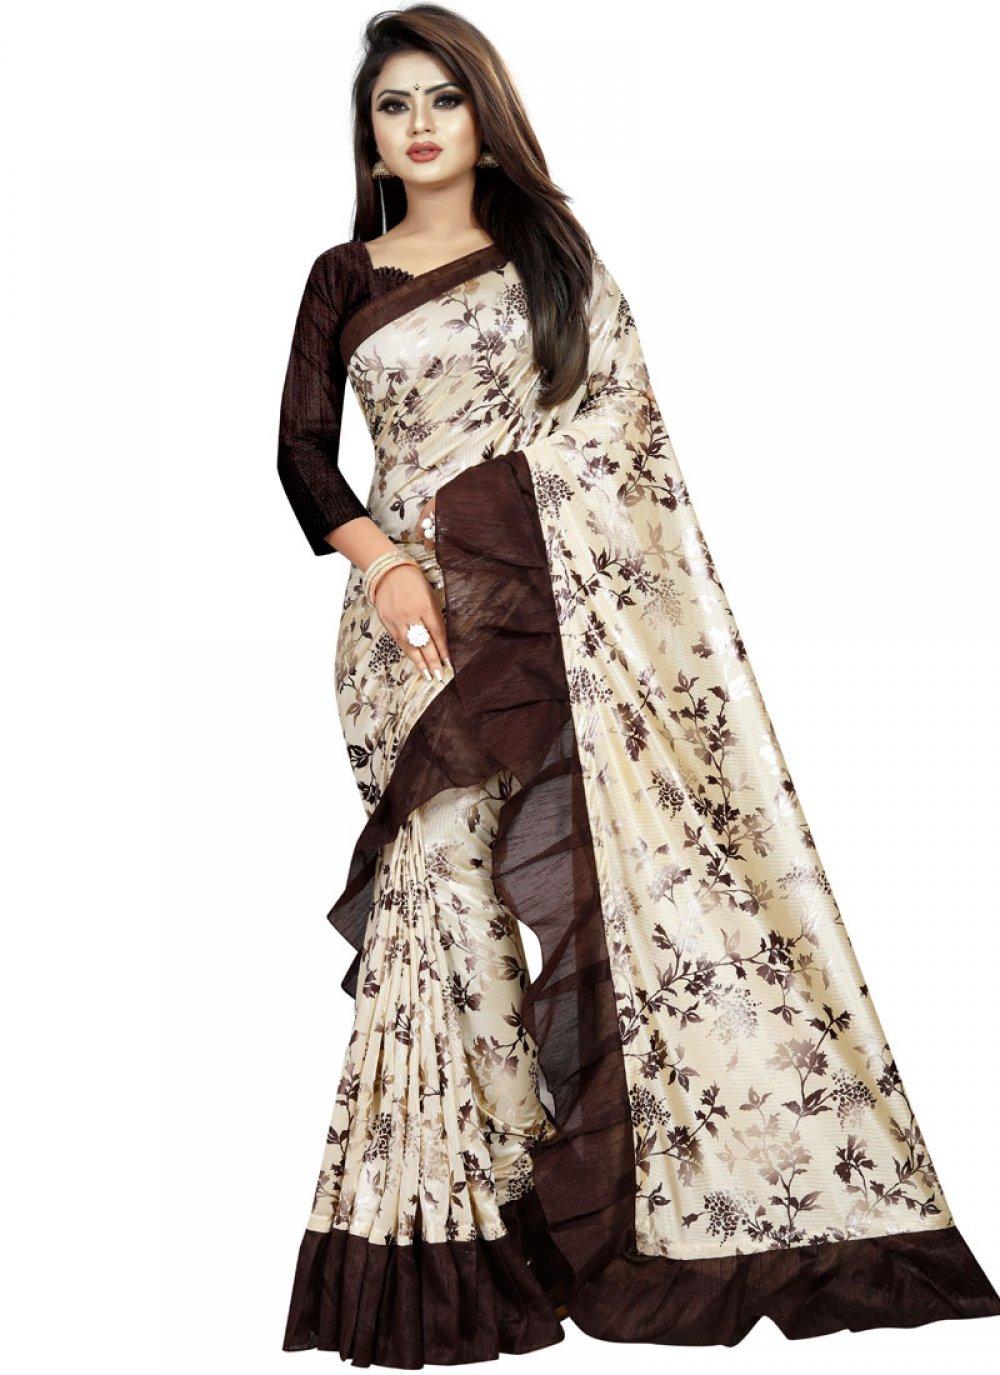 Lycra Printed Saree in Multi Colour